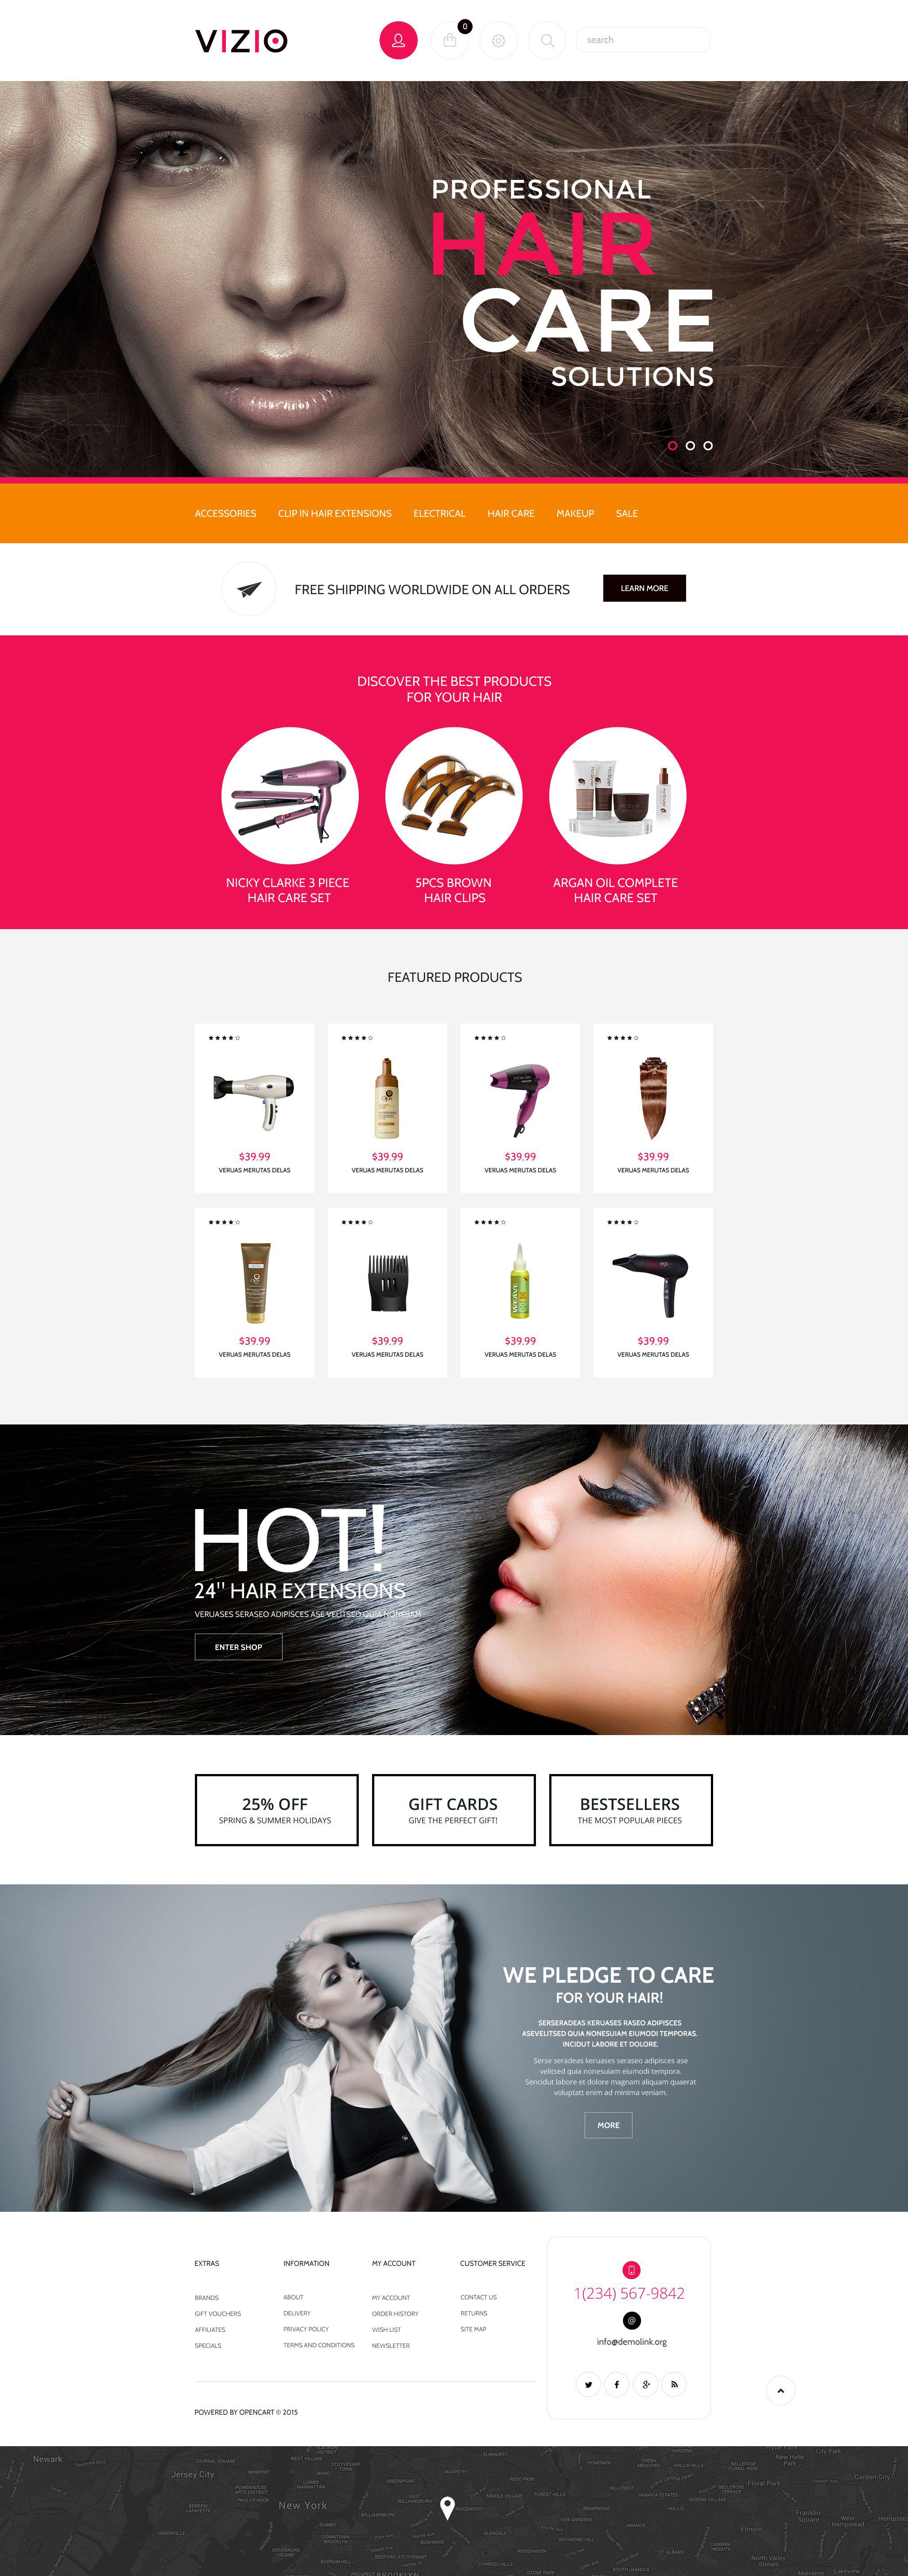 Hair Salon Responsive Shopify Theme - screenshot